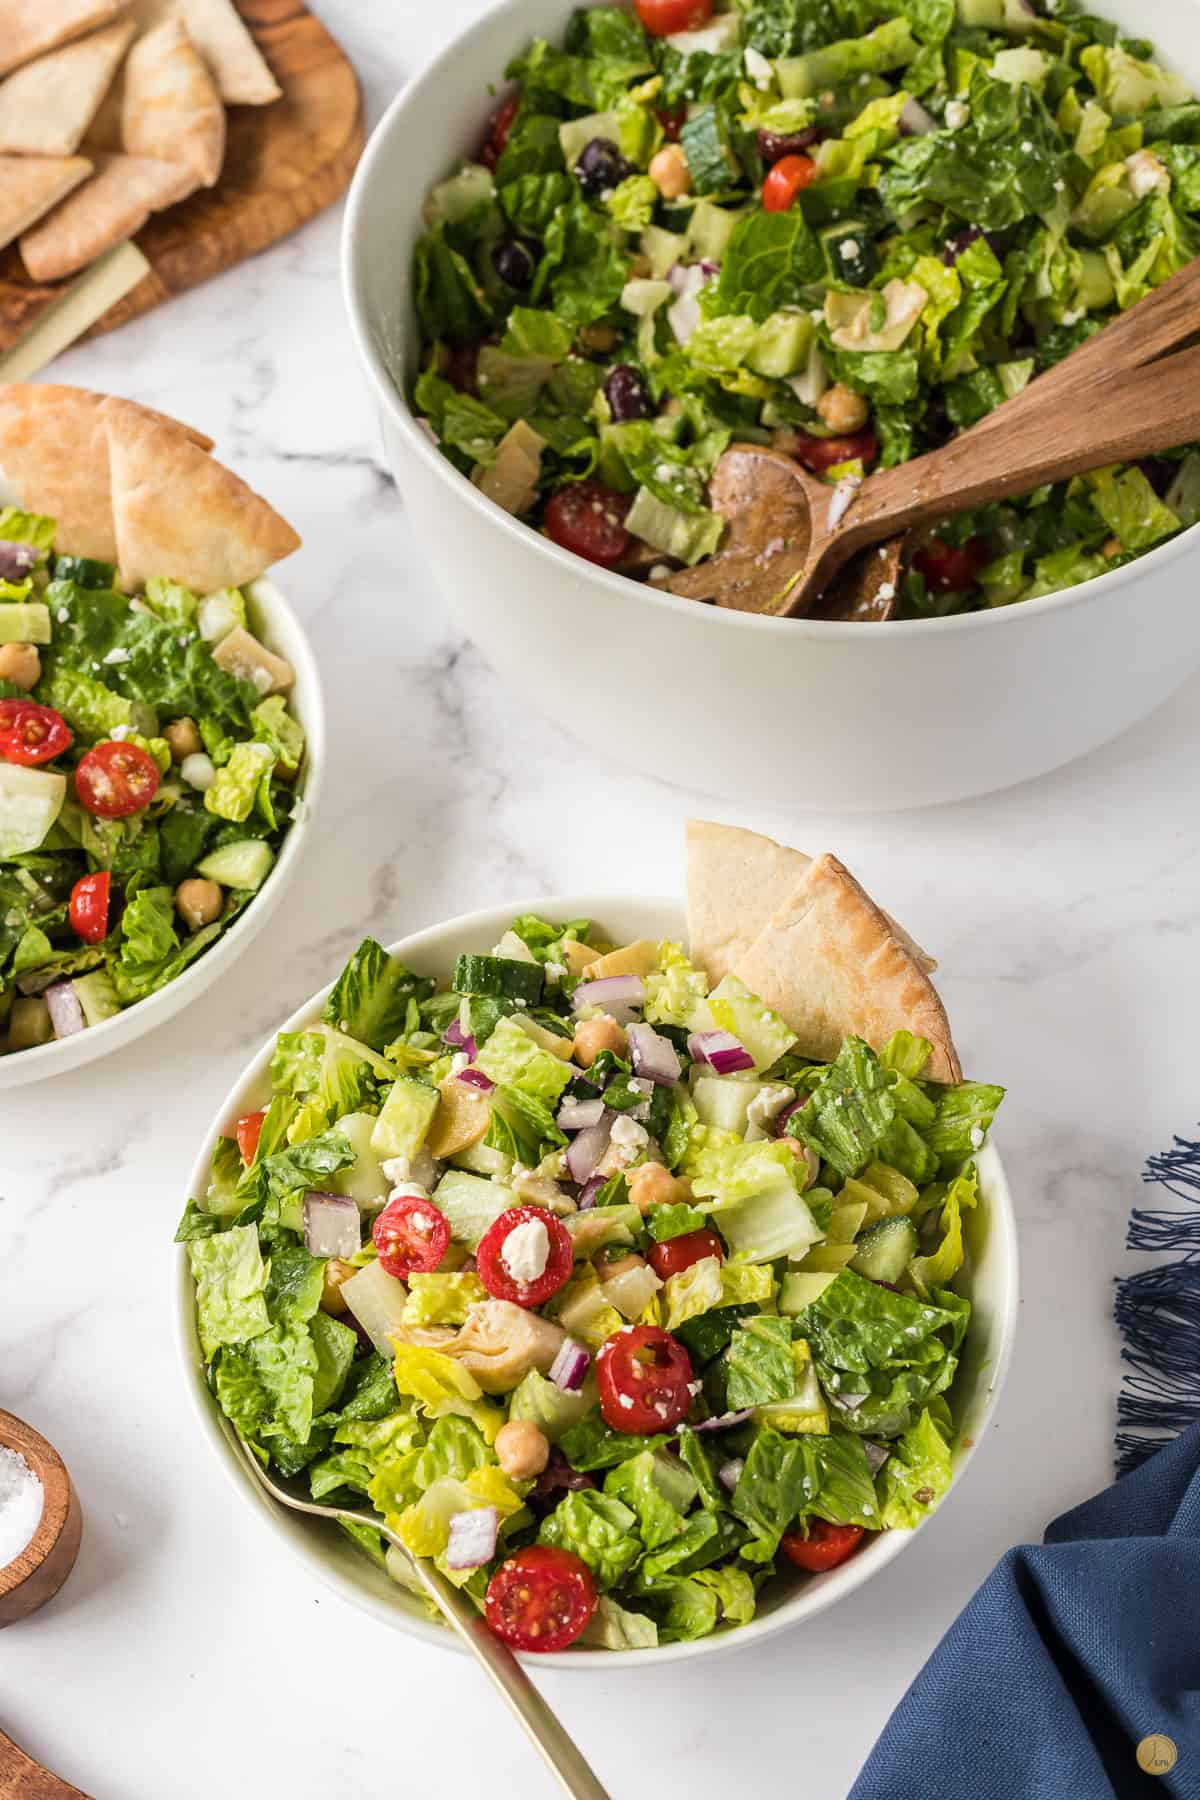 three bowls of salad